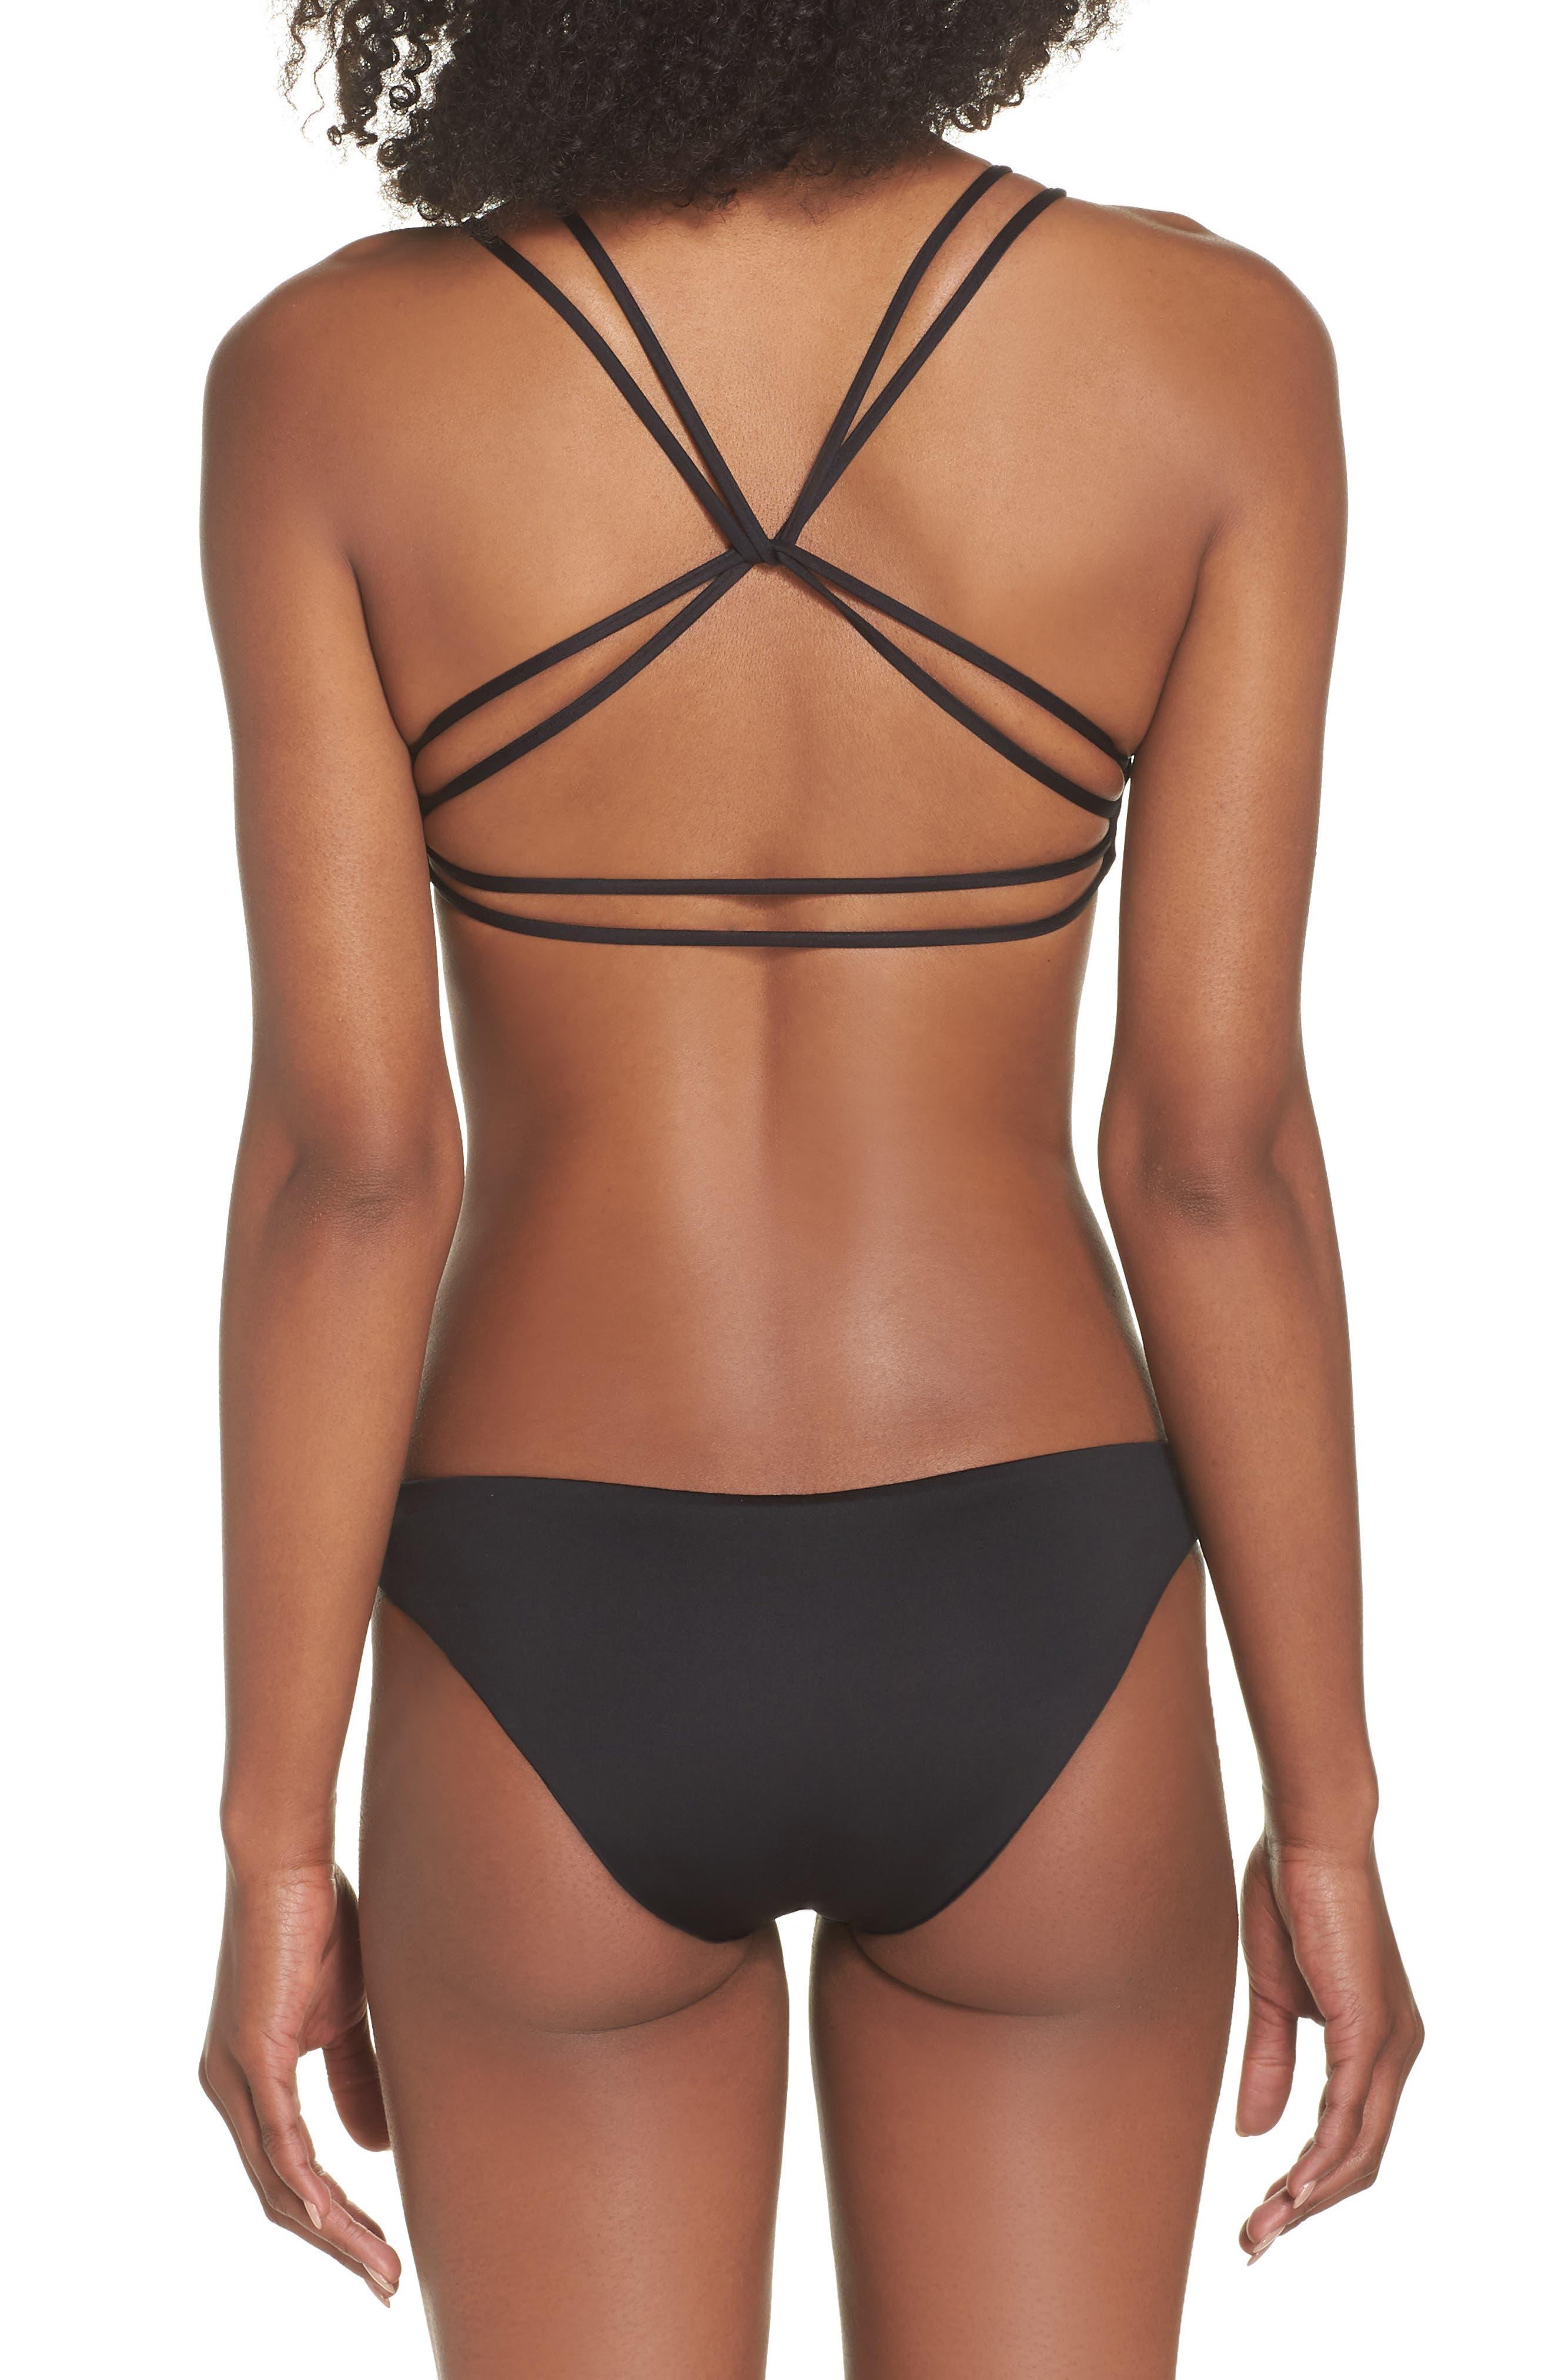 Seaglass Bay Reversible Bikini Bottoms,                             Alternate thumbnail 8, color,                             BLACK